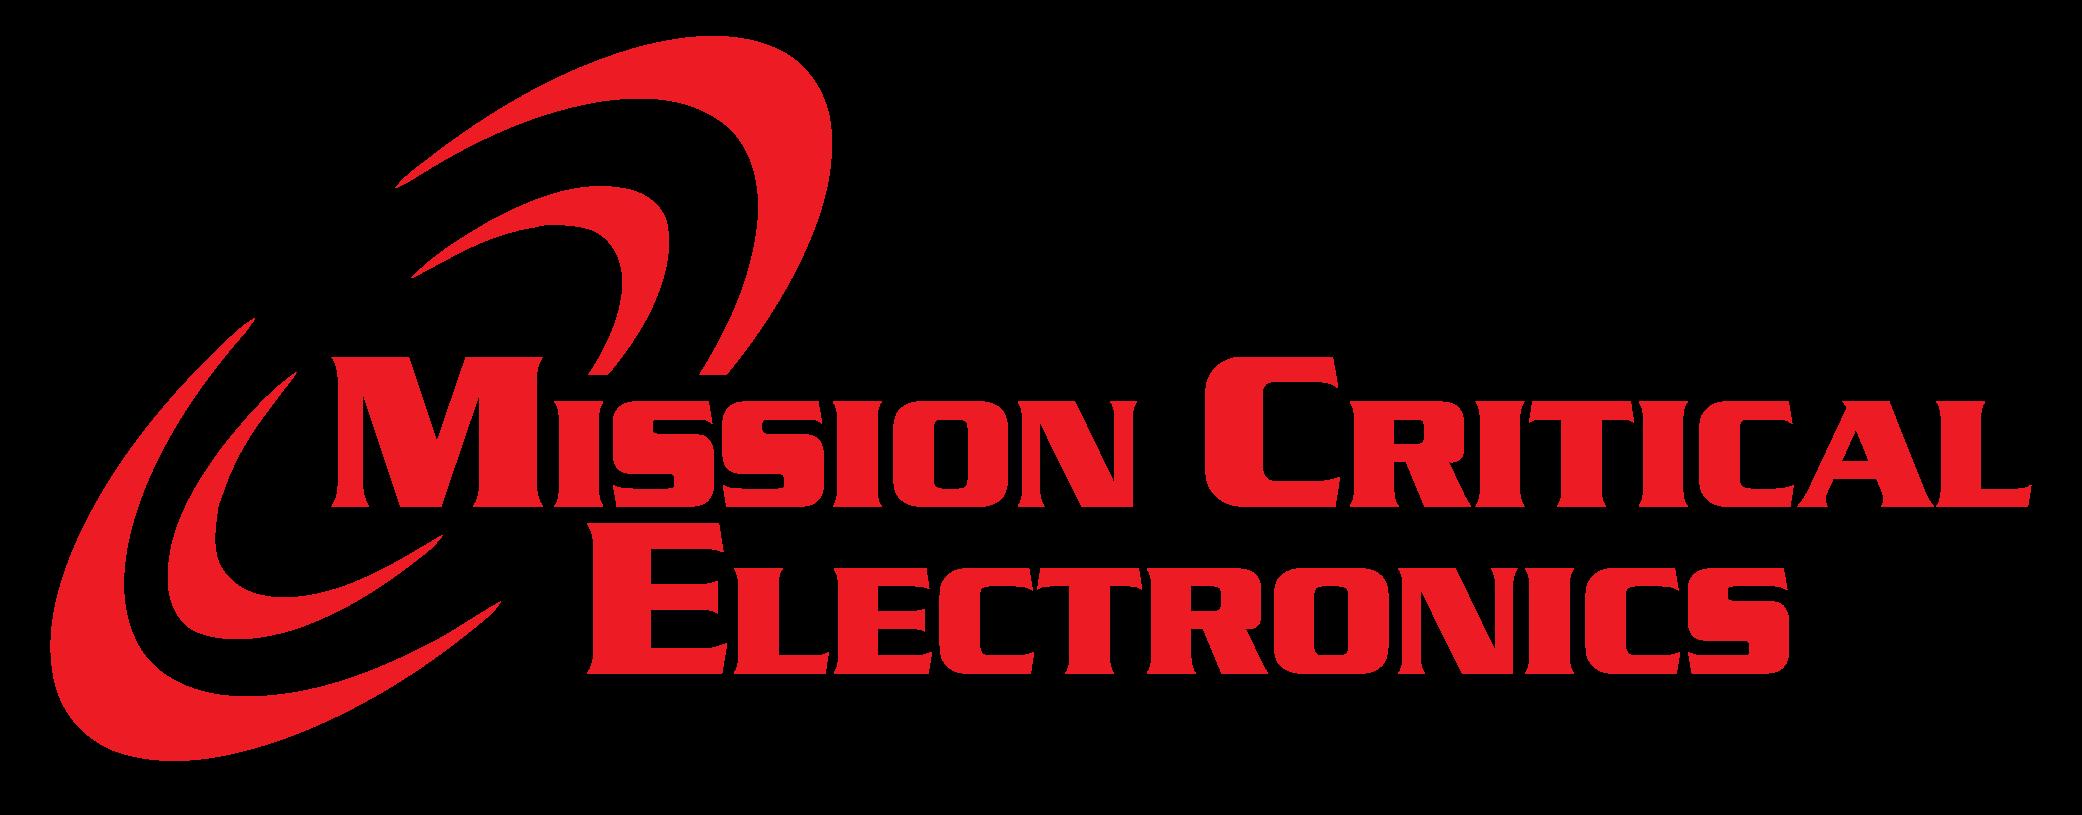 Mission Critical Electronics logo